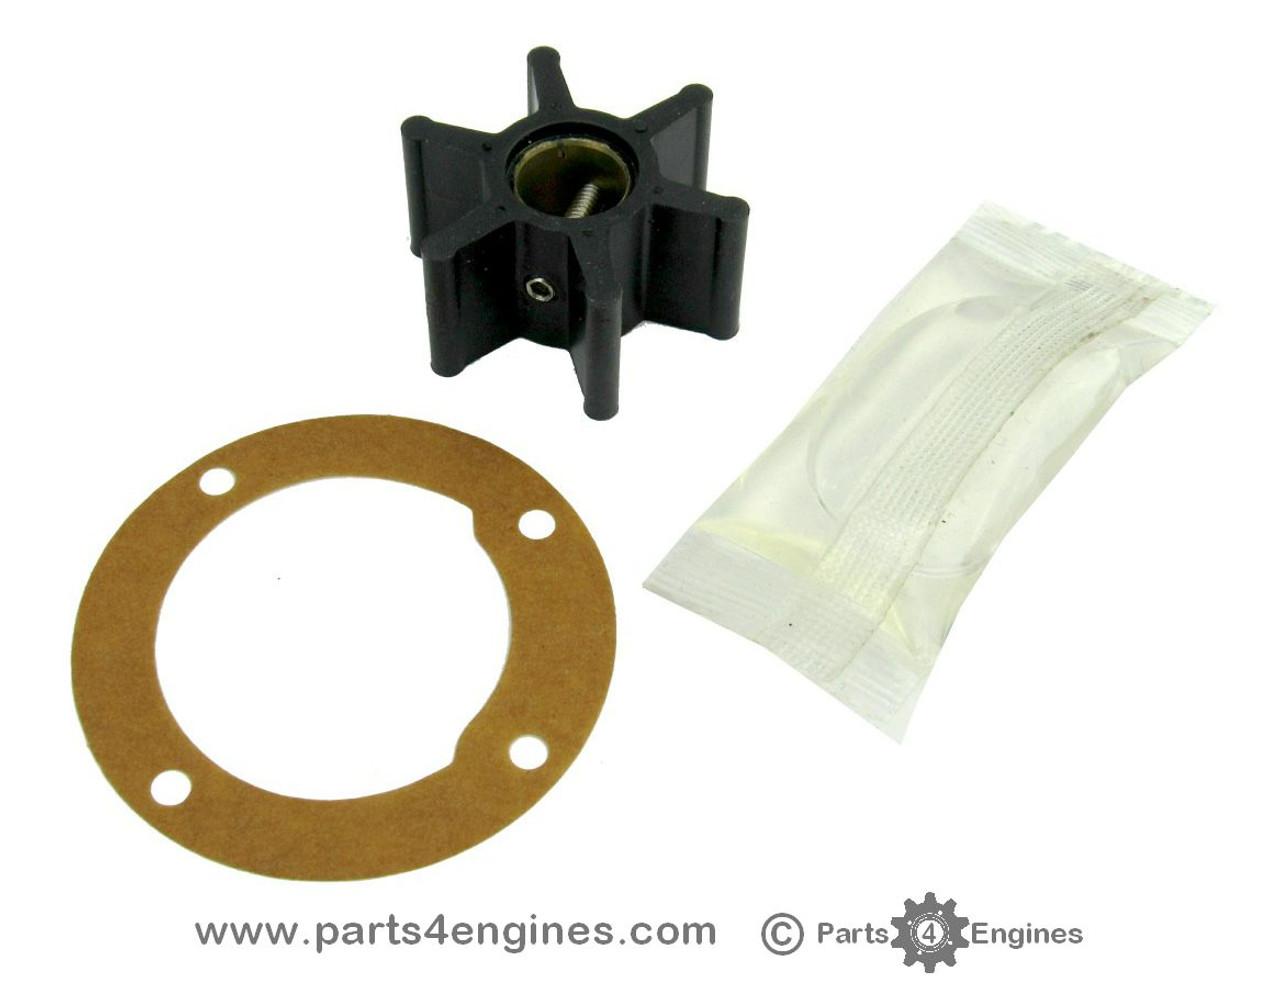 Volvo Penta 2001 raw water pump impeller kit - Parts4engines.com